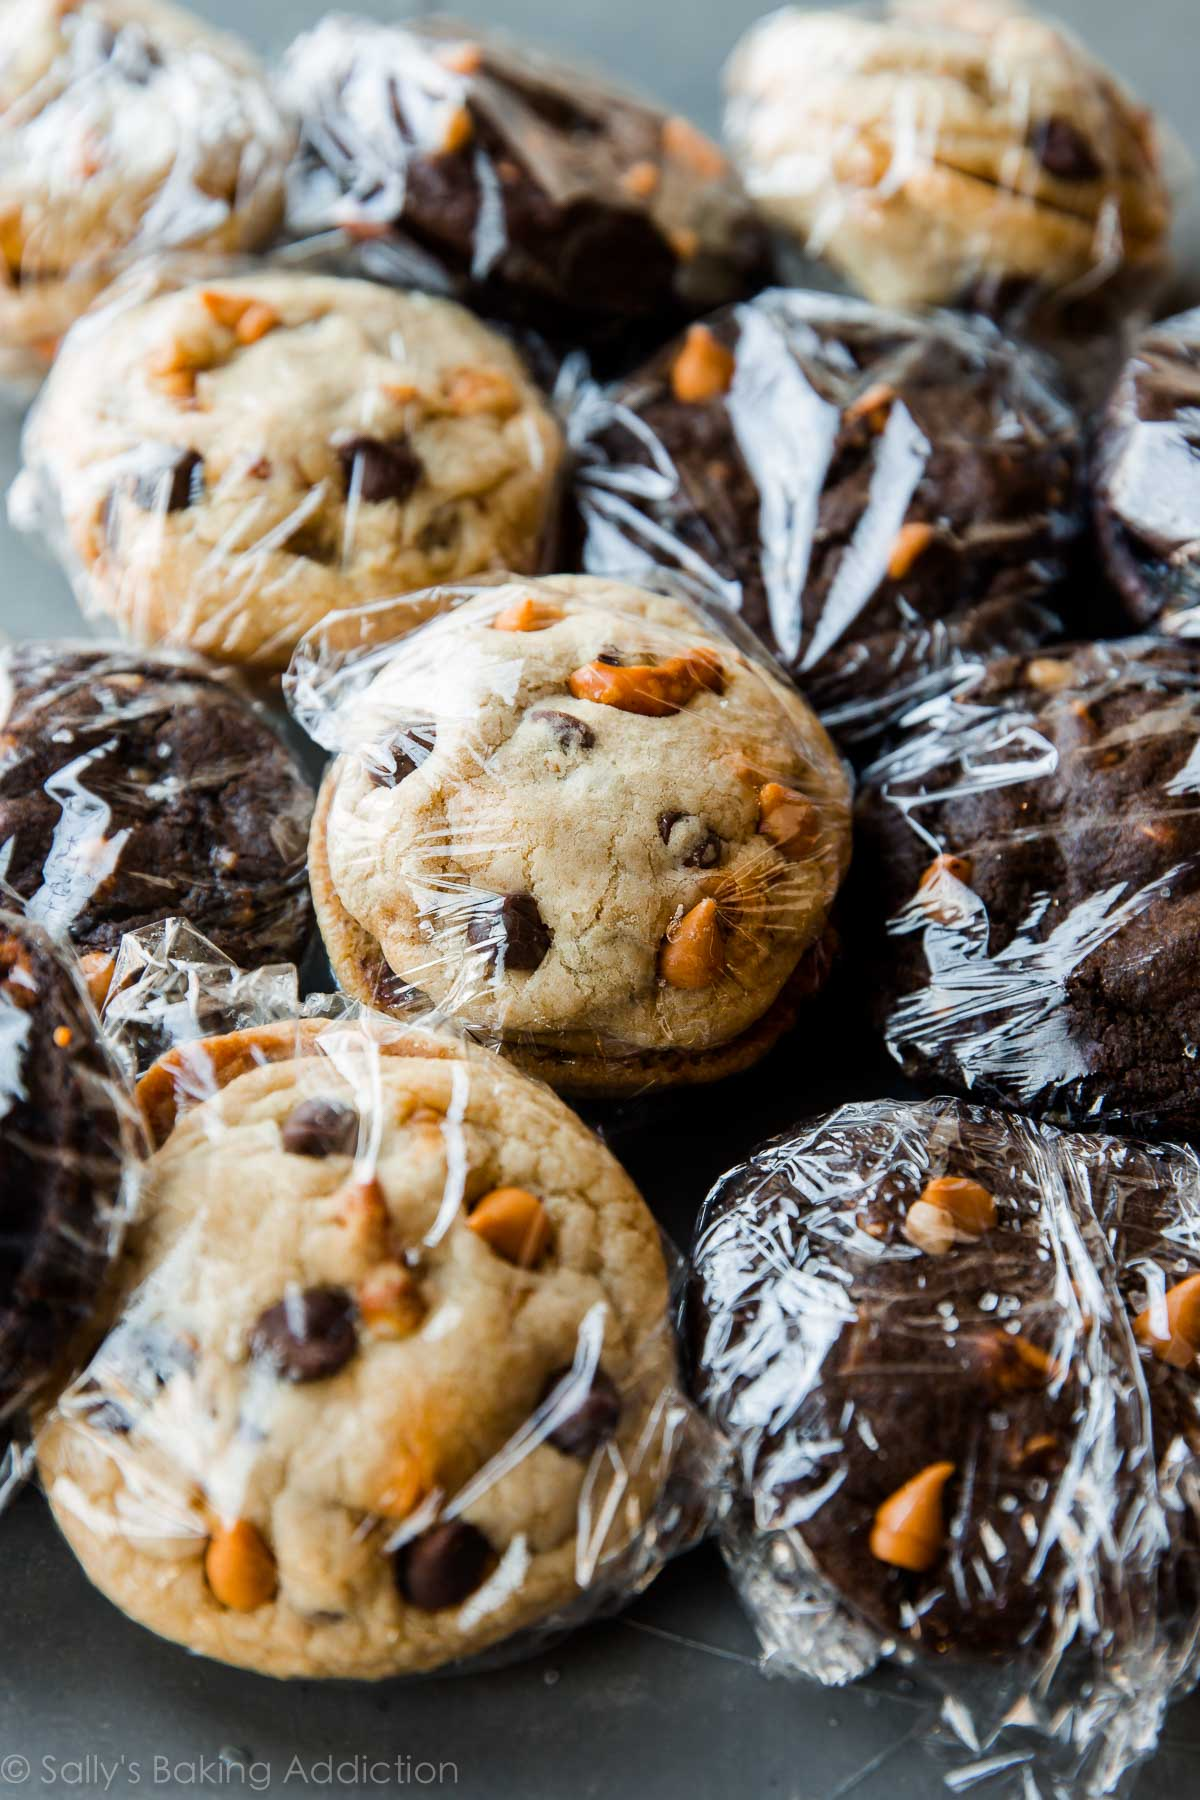 Here's the BEST way to ship cookies this holiday season! sallysbakingaddiction.com